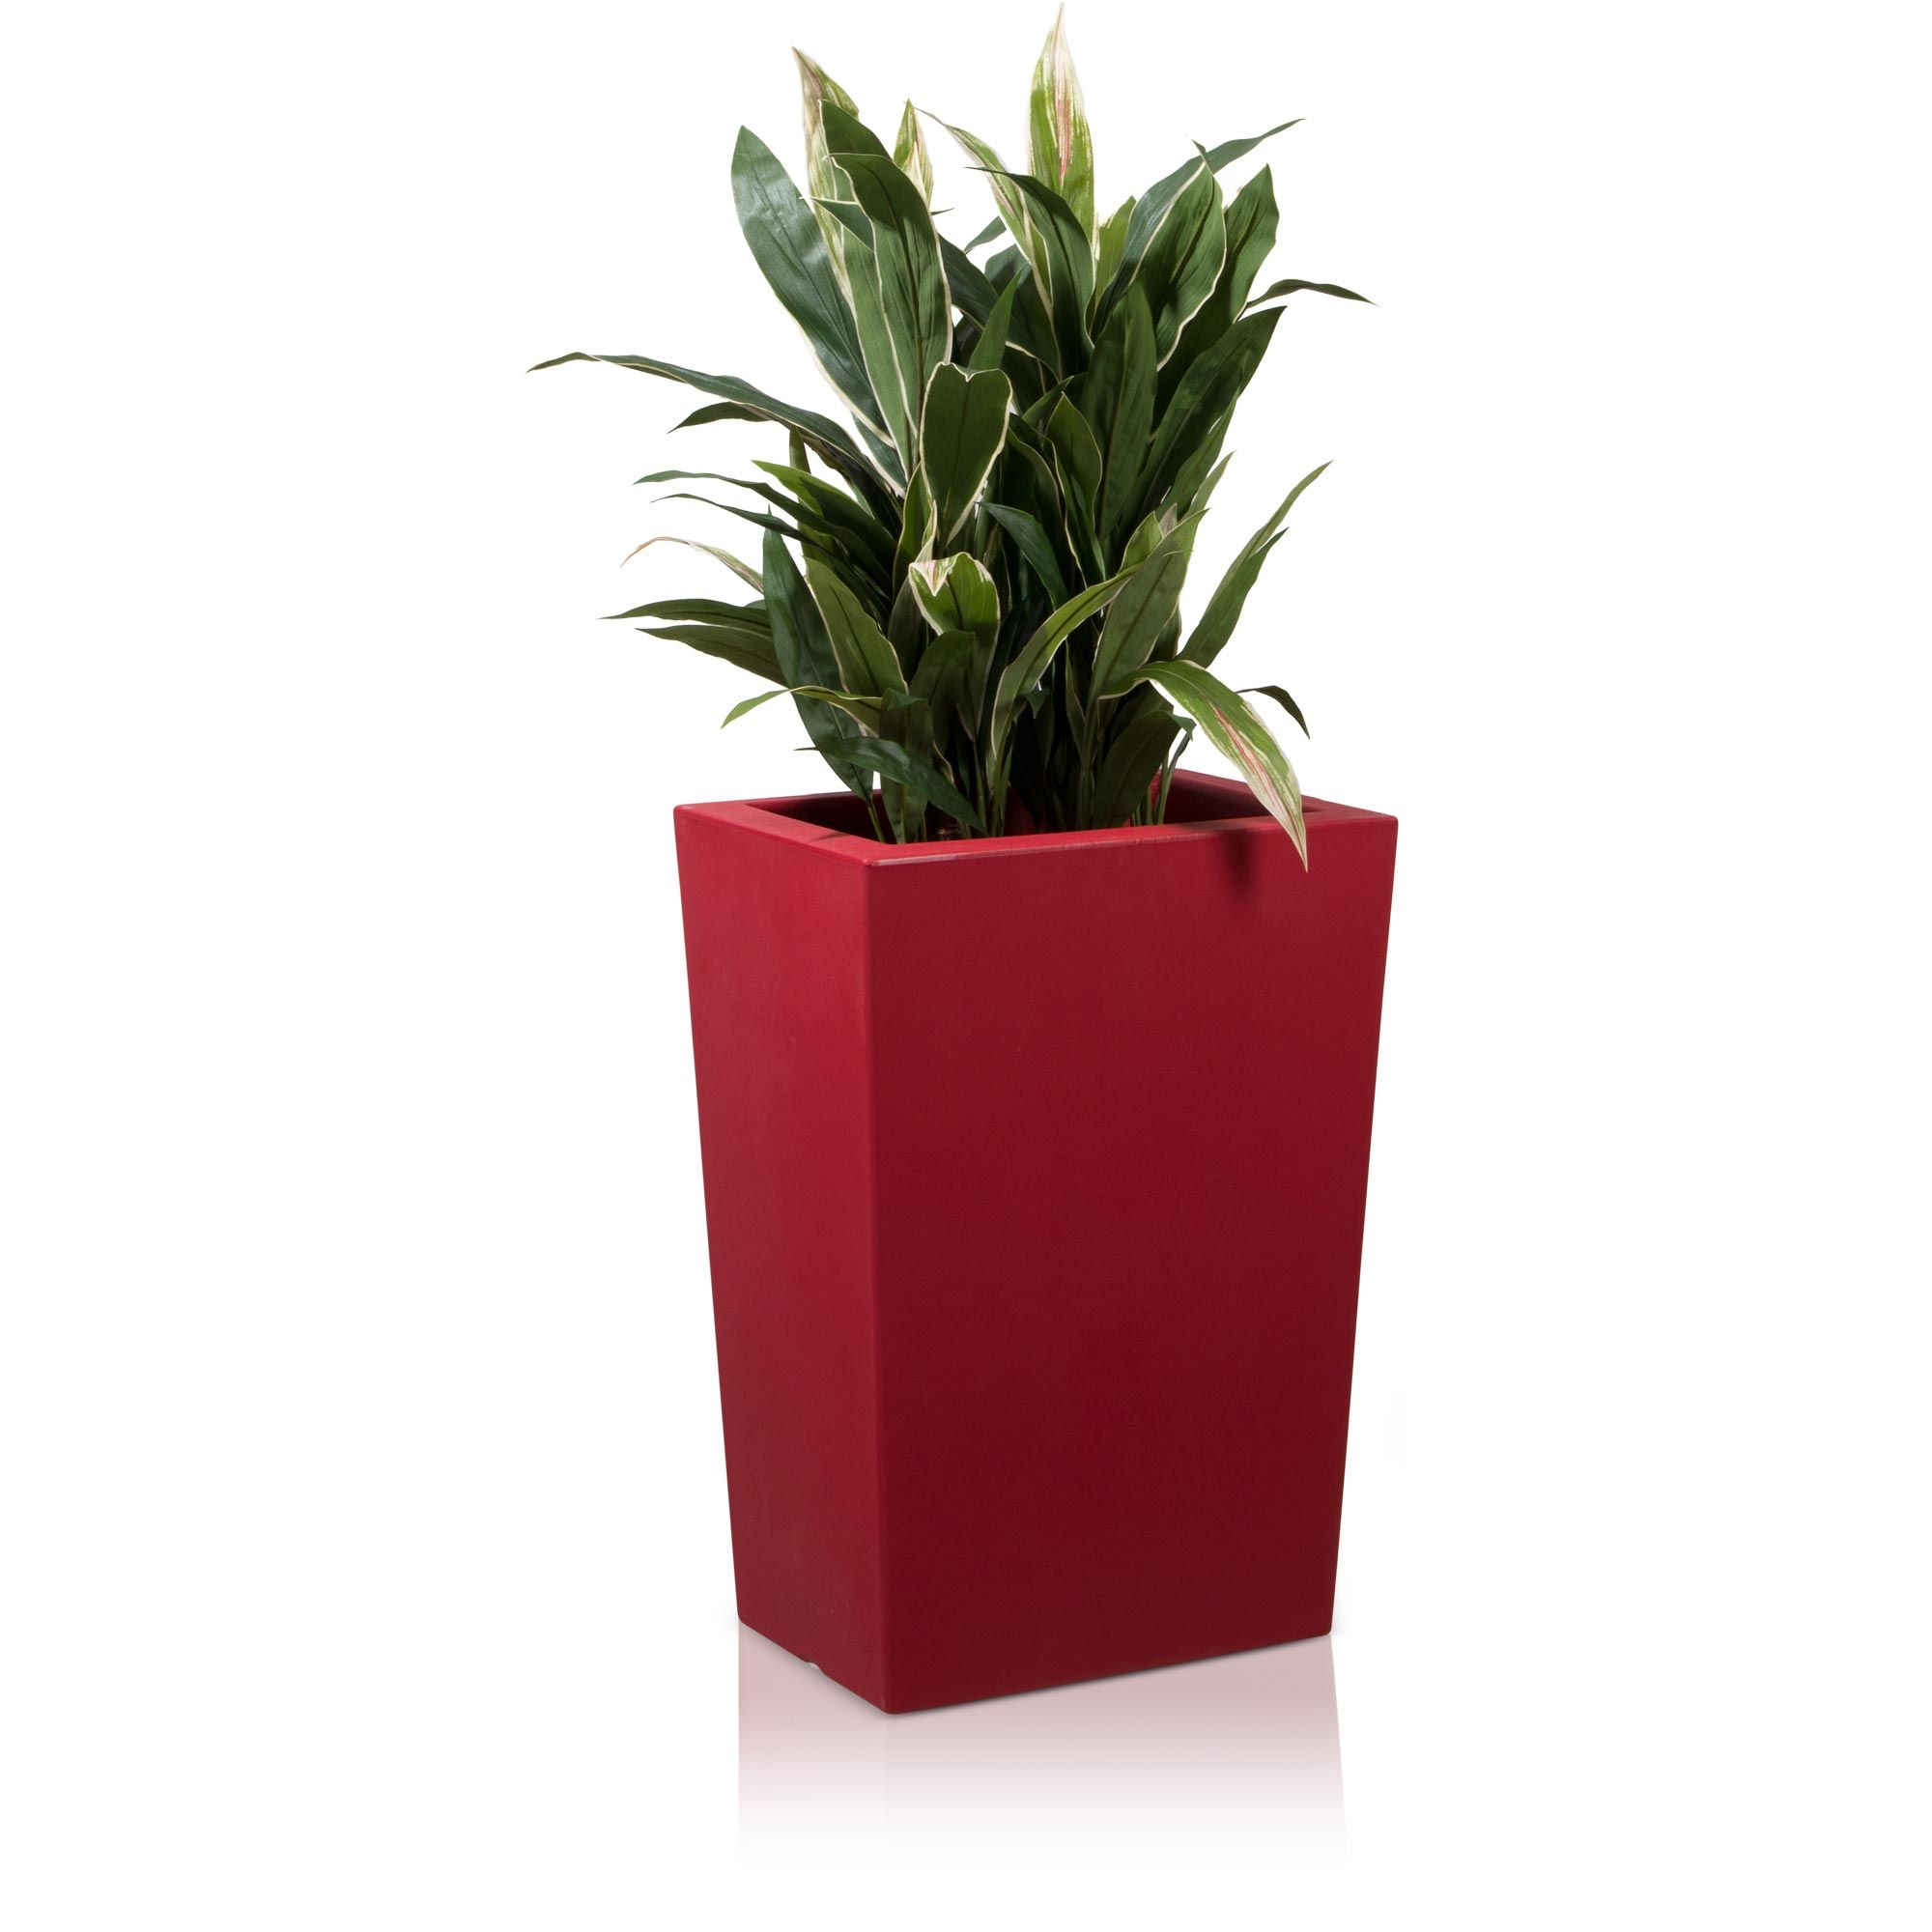 Raumteiler Largo M 70 Kunststoff Rot Matt Plastic Planter